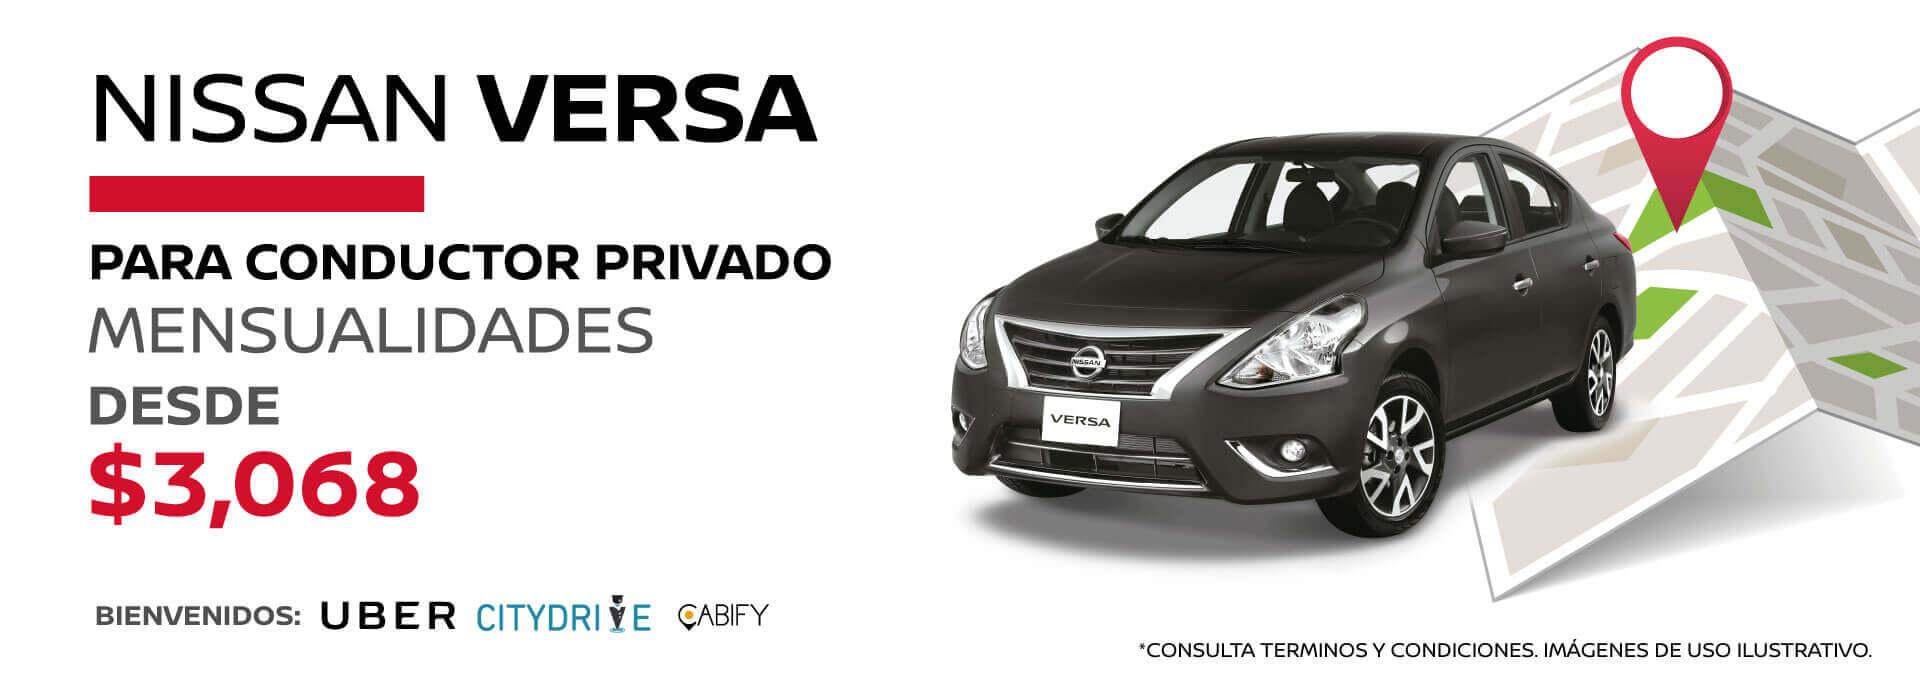 Chofer privado Nissan